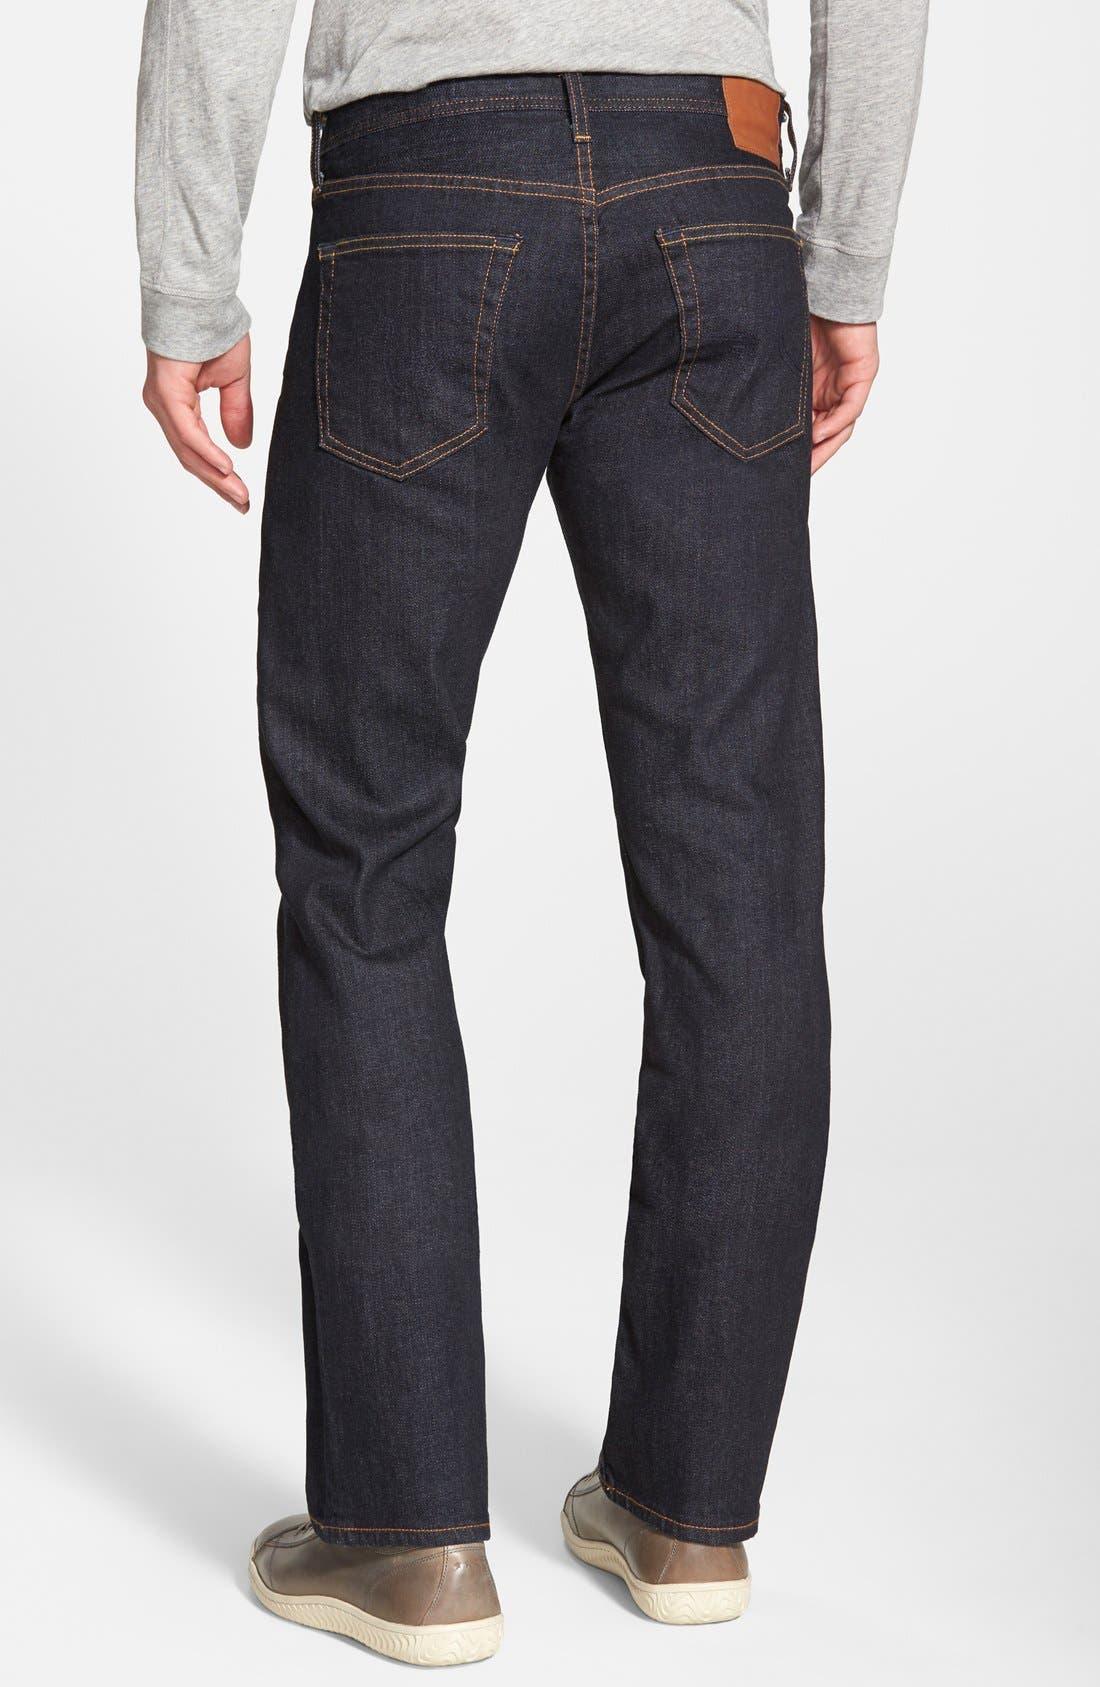 Protégé Straight Leg Jeans,                             Alternate thumbnail 2, color,                             461